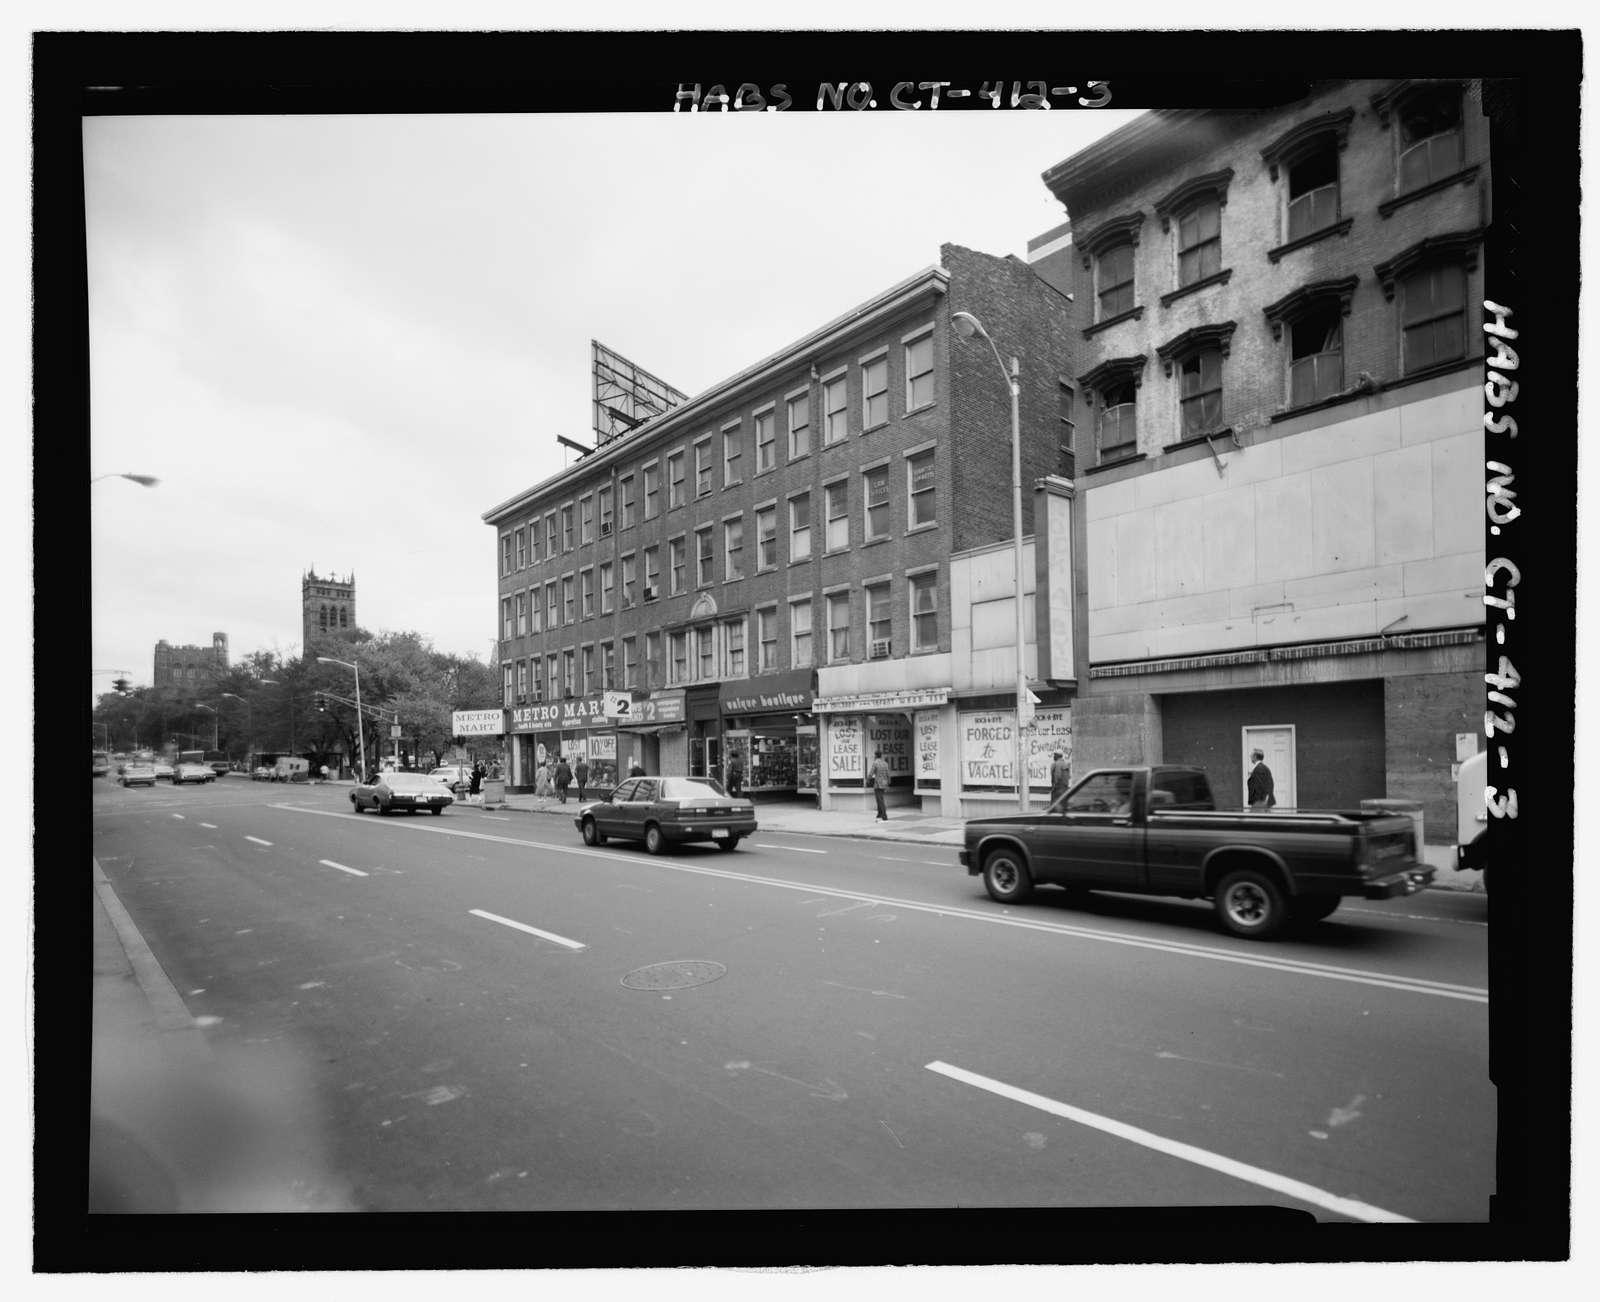 Exchange Building, 121-127 Church Street, 855-871 Chapel Street, New Haven, New Haven County, CT